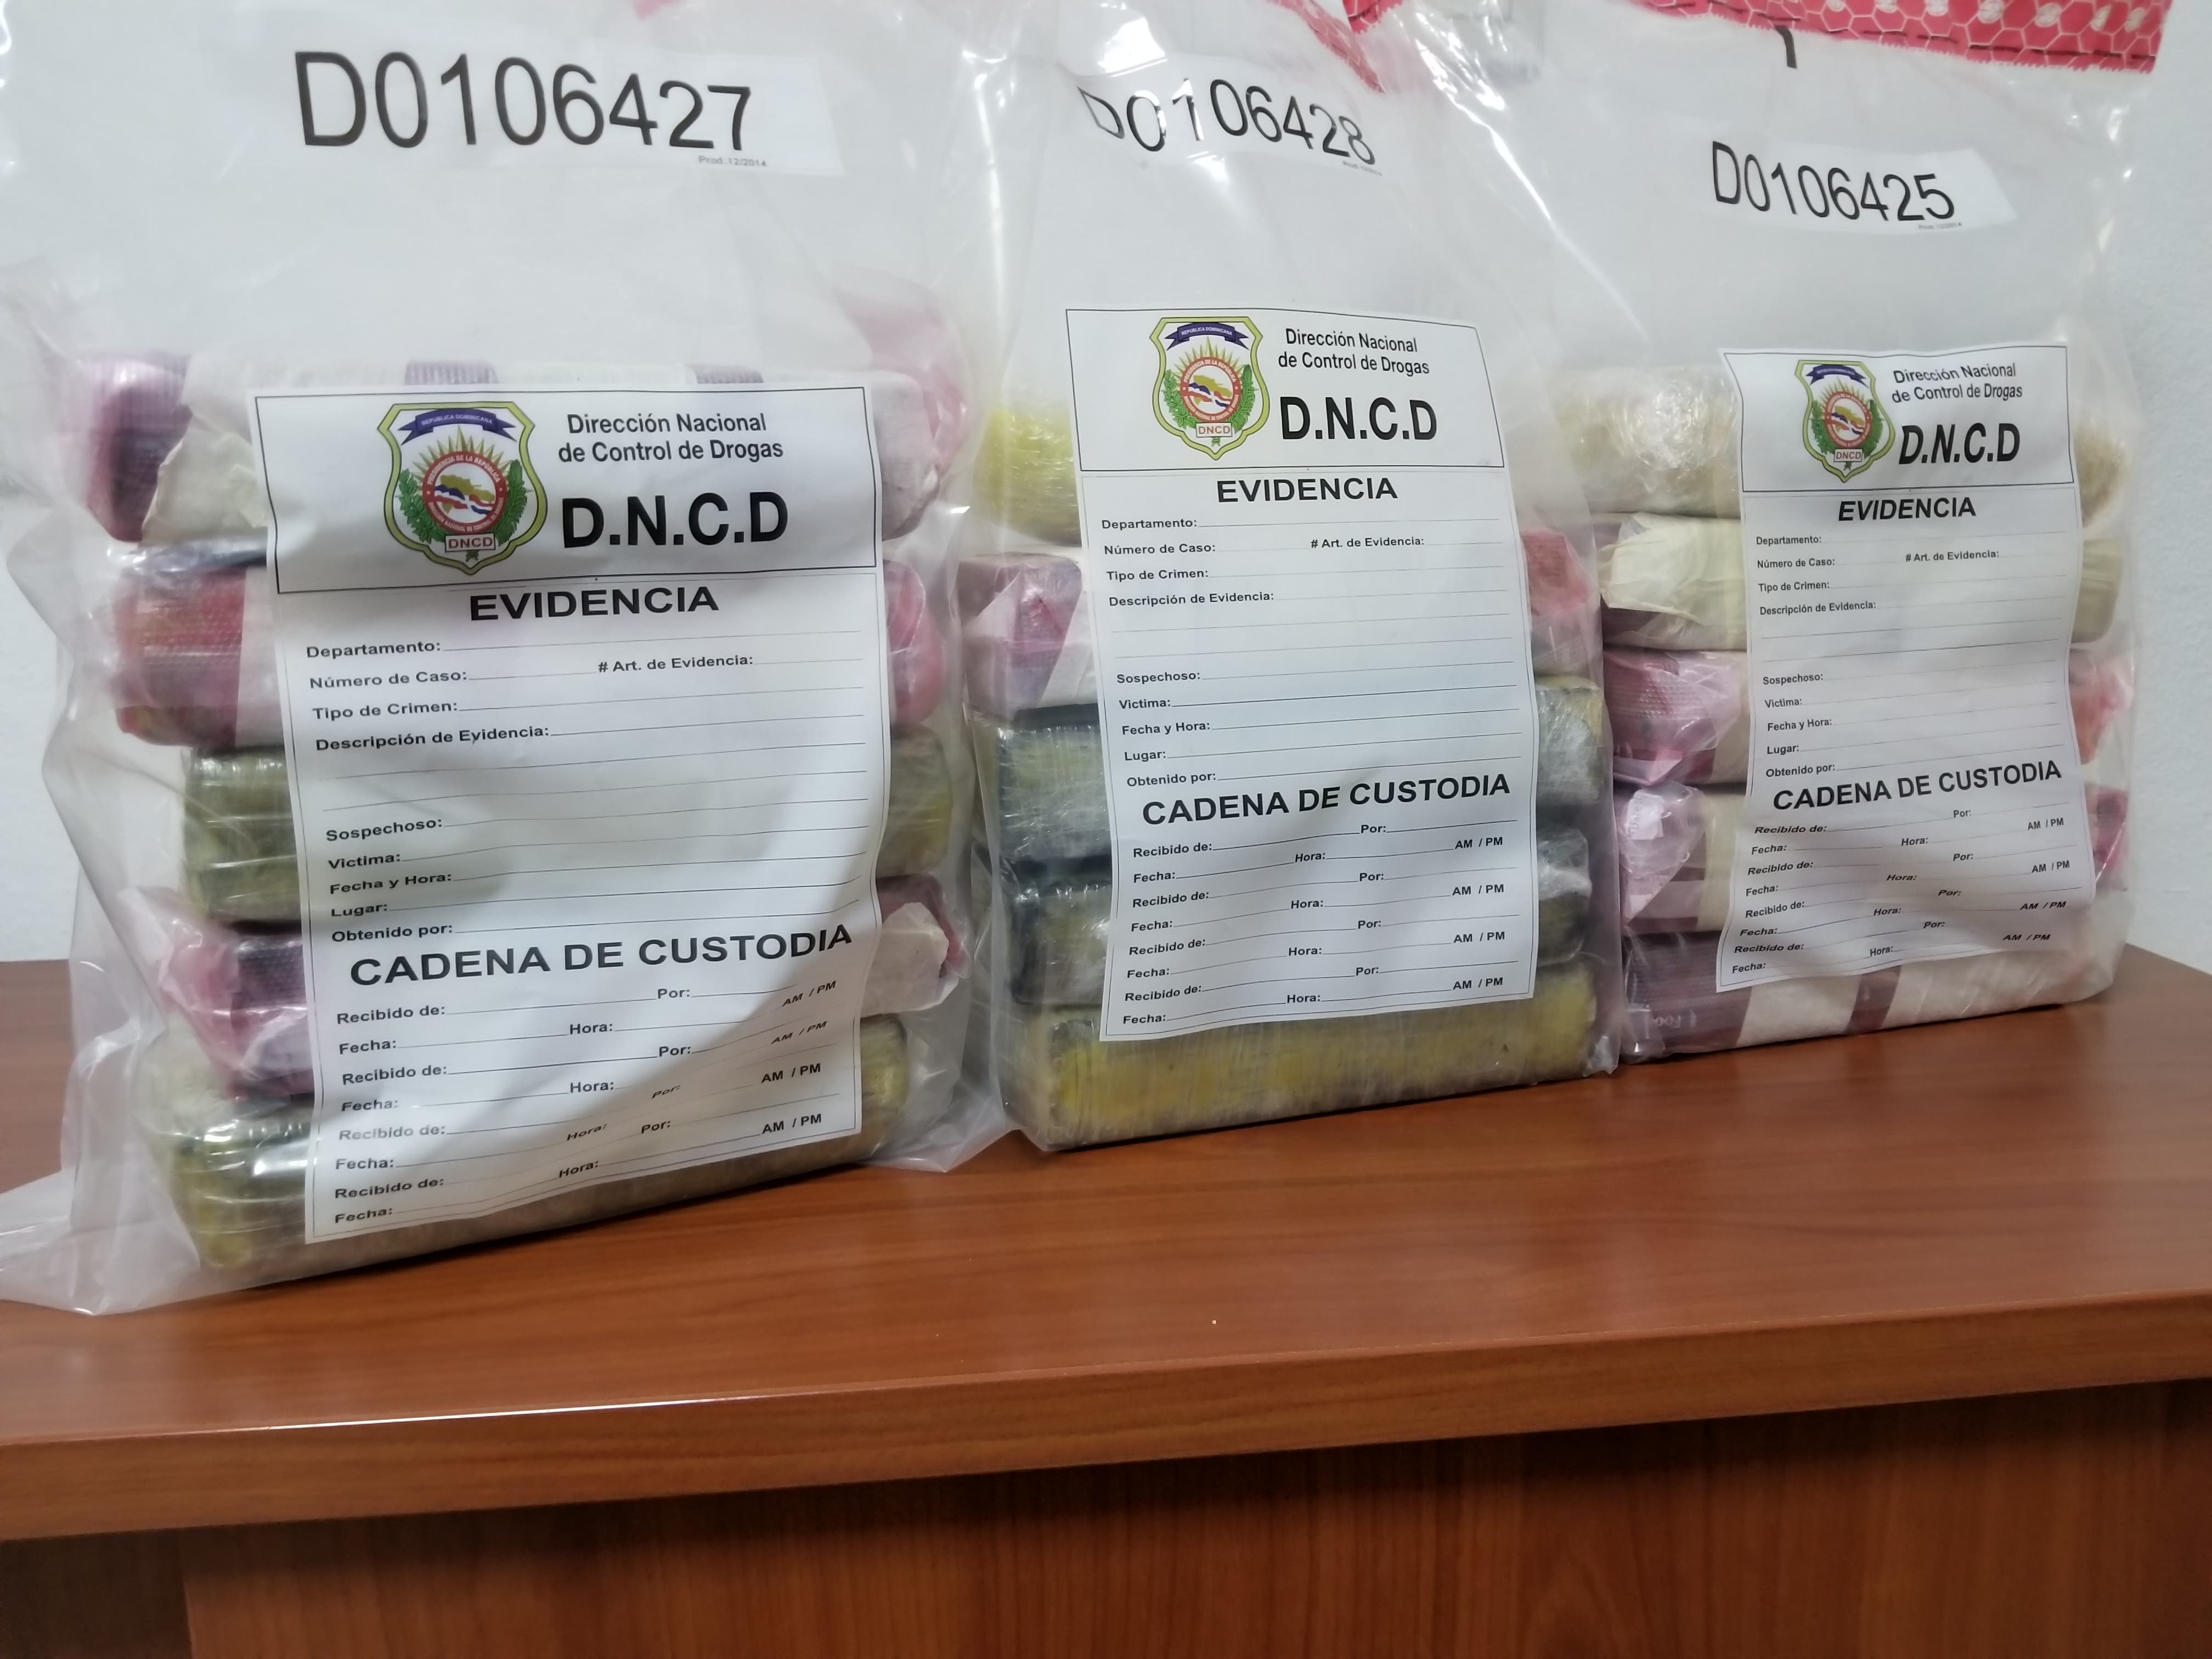 DNCD ocupa 9 paquetes de cocaína y apresa a 3 personas en Alma Rosa